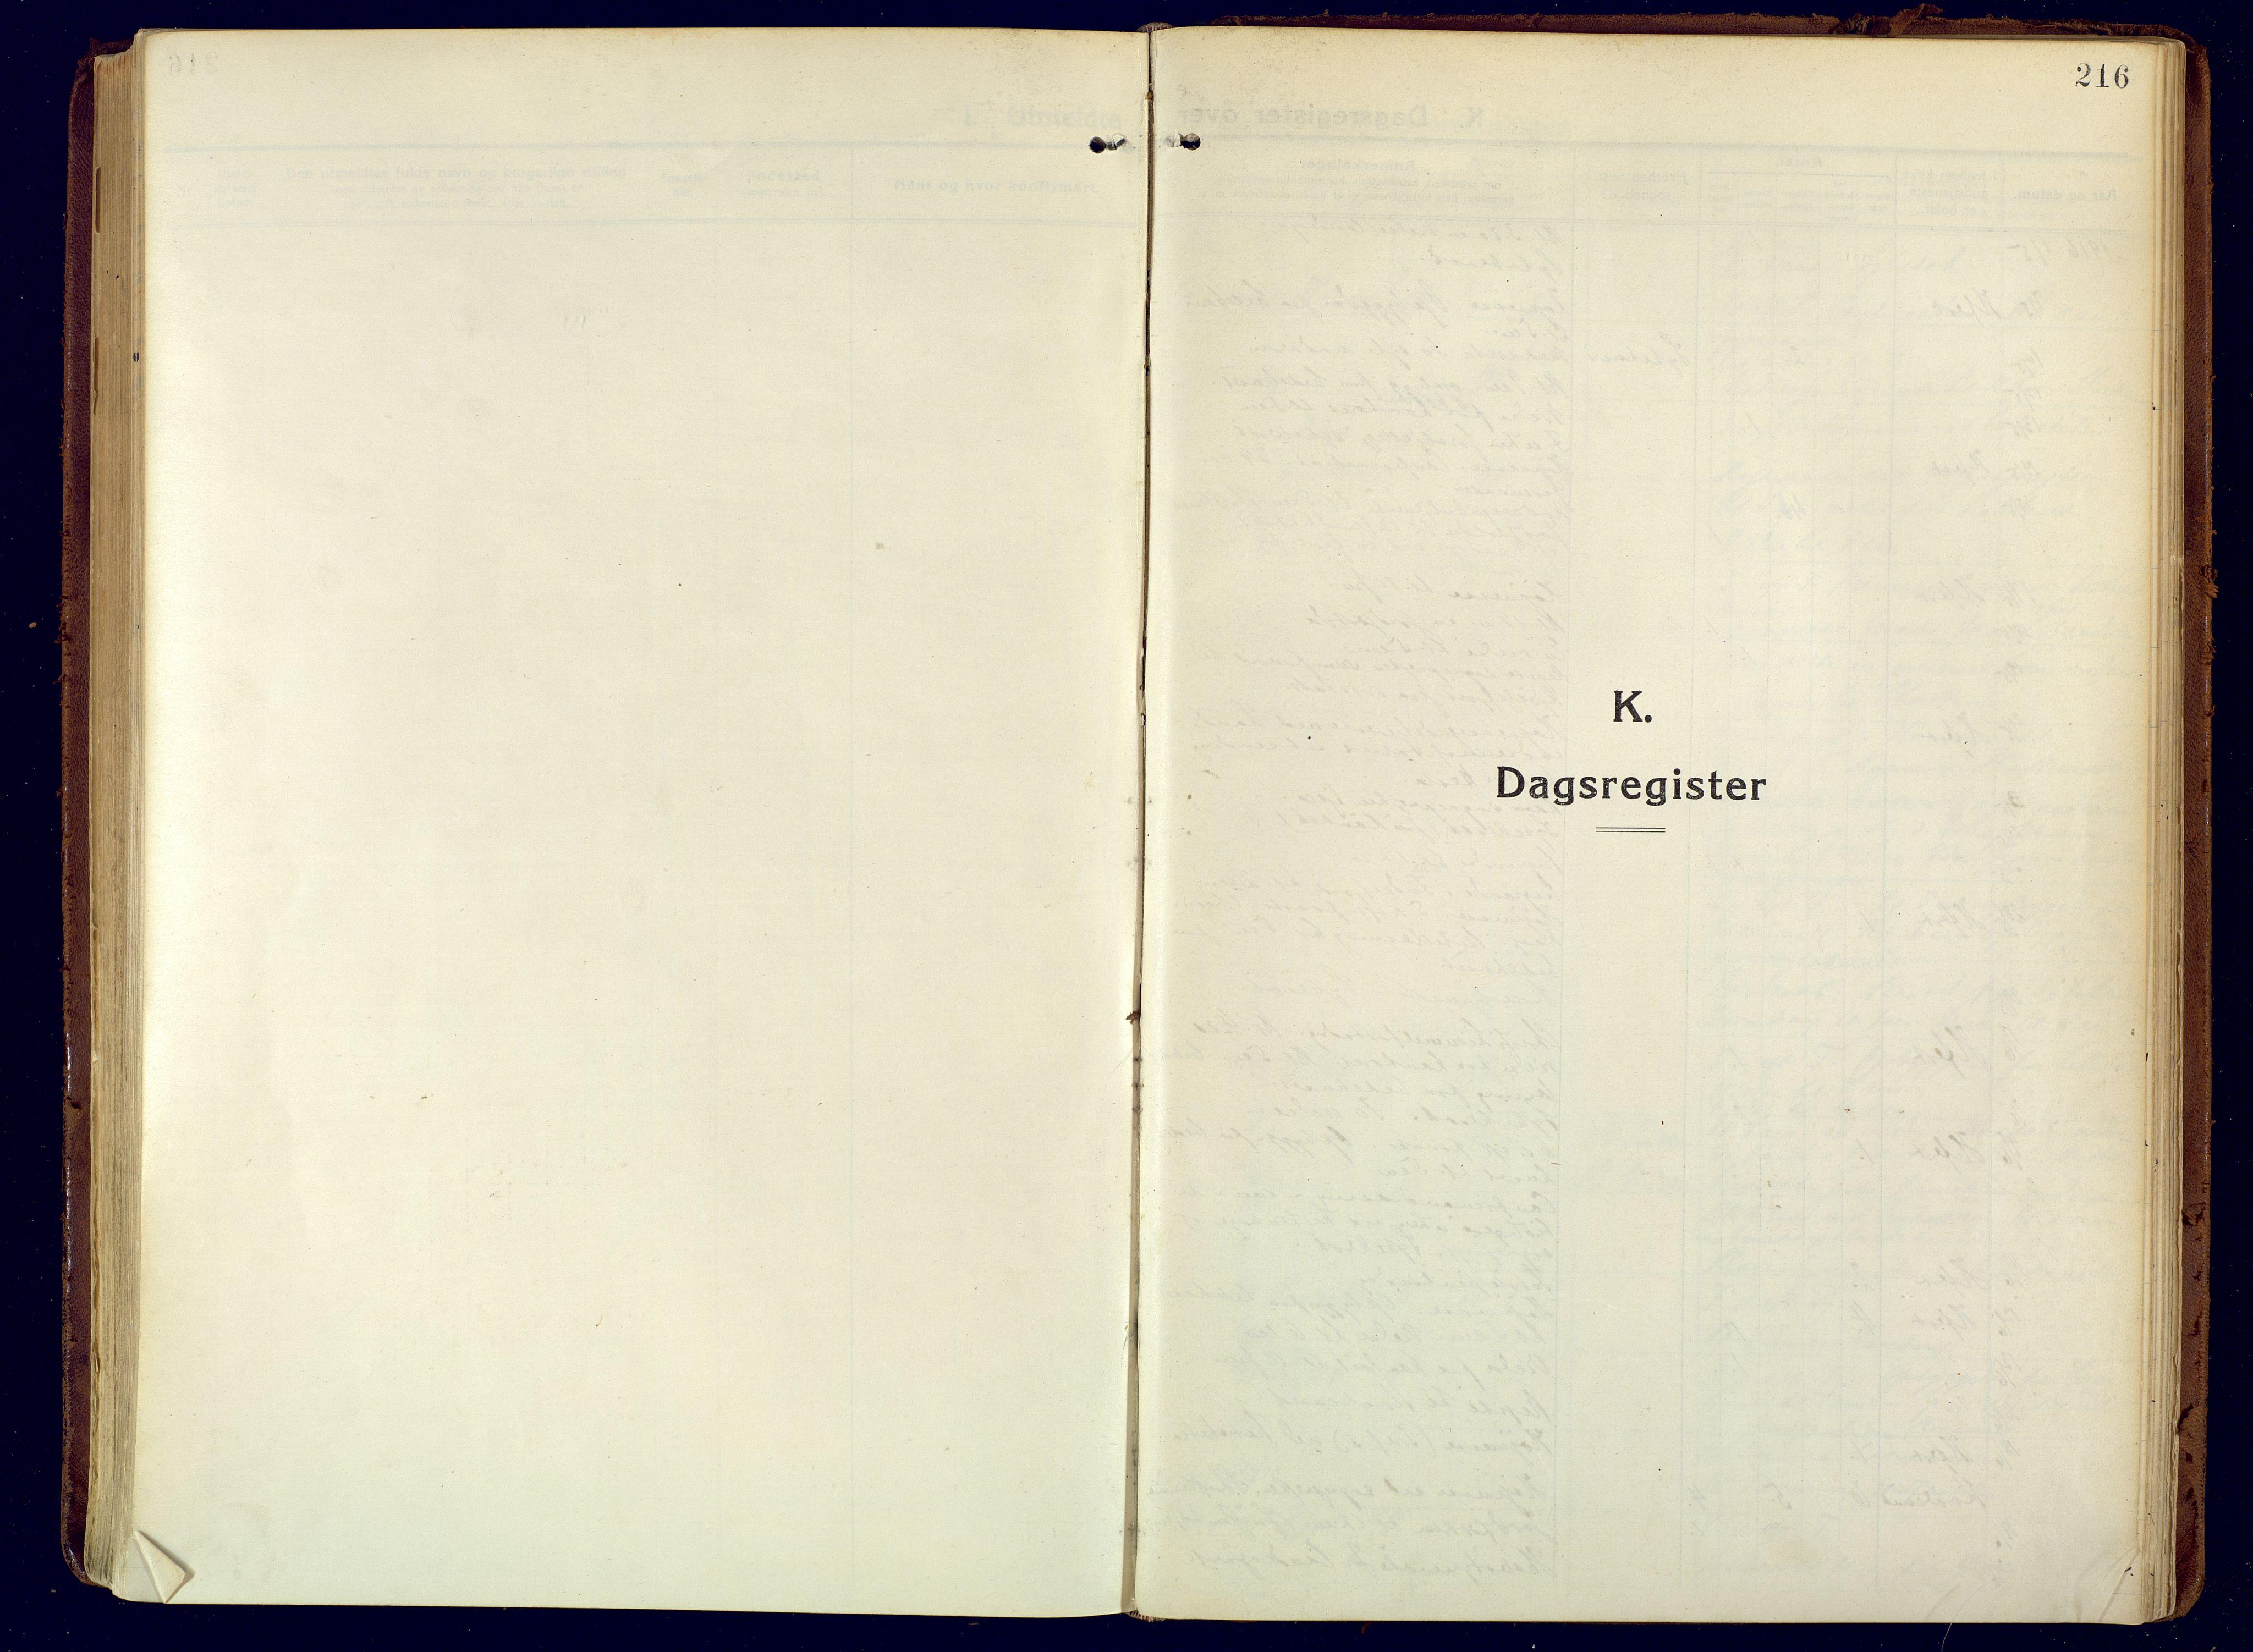 SATØ, Hammerfest sokneprestembete, Ministerialbok nr. 15, 1916-1923, s. 216